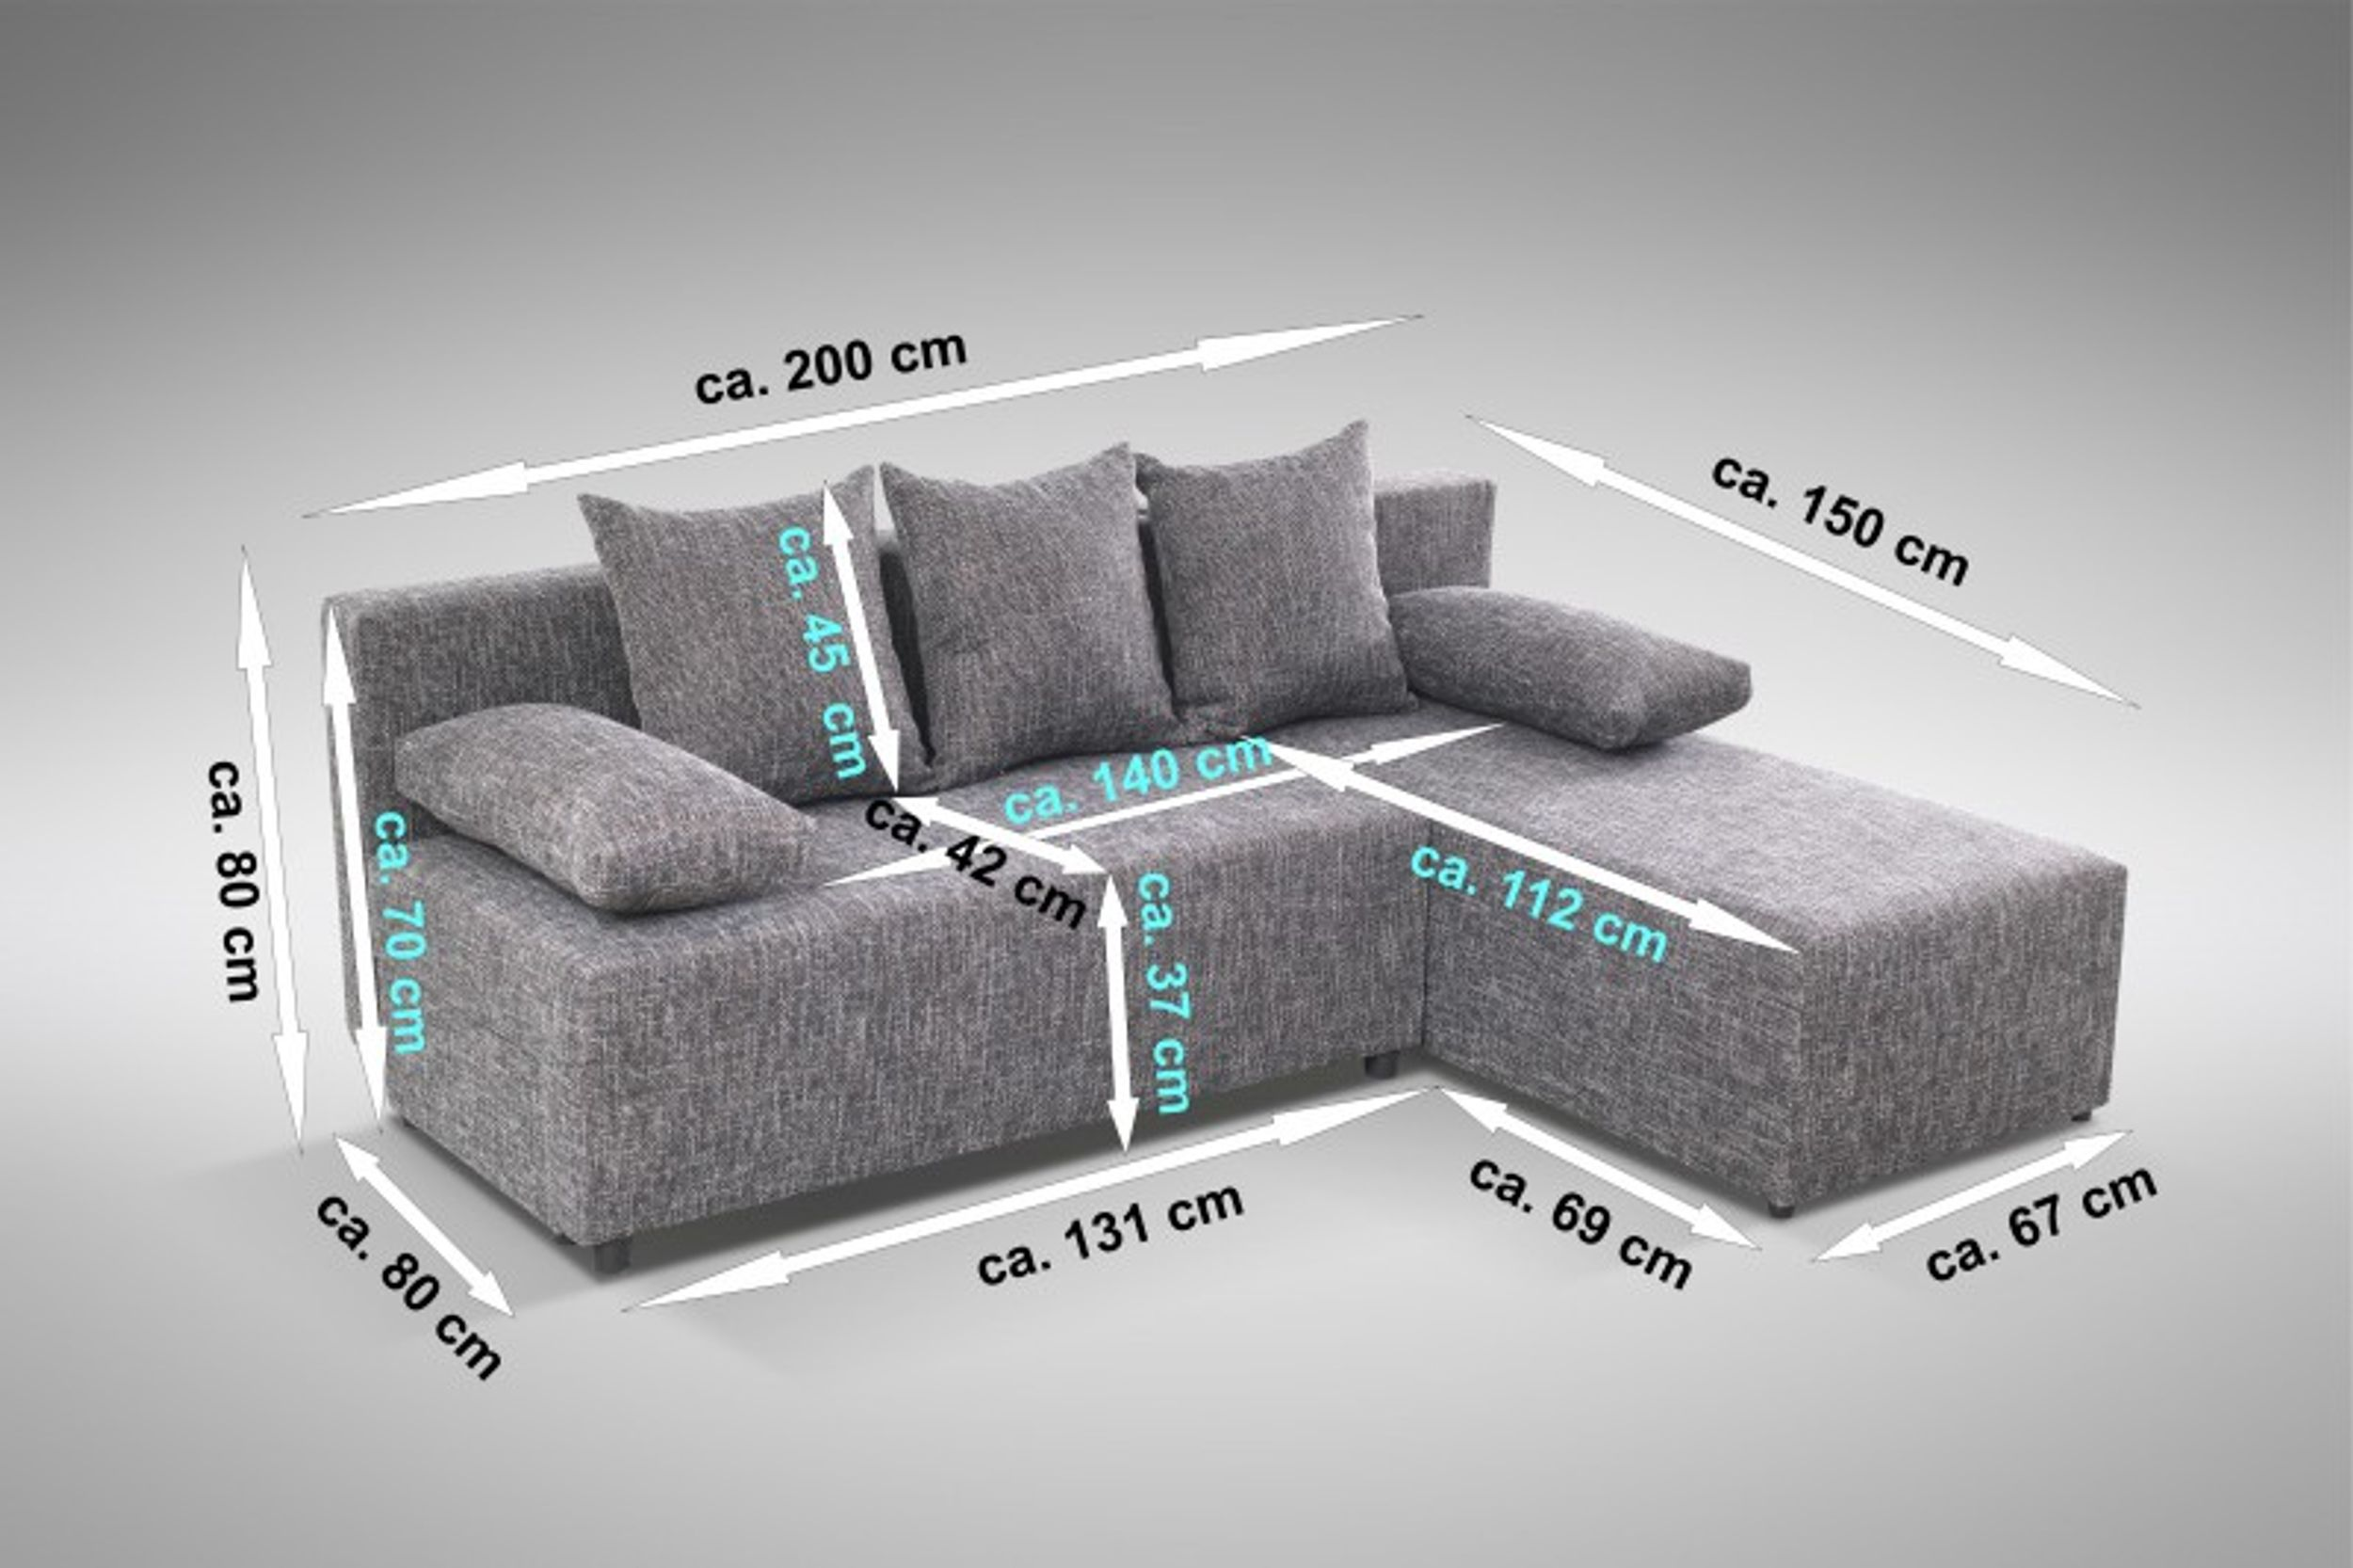 schlafsofa sofa couch ecksofa eckcouch grau schlaffunktion astana l r ebay. Black Bedroom Furniture Sets. Home Design Ideas